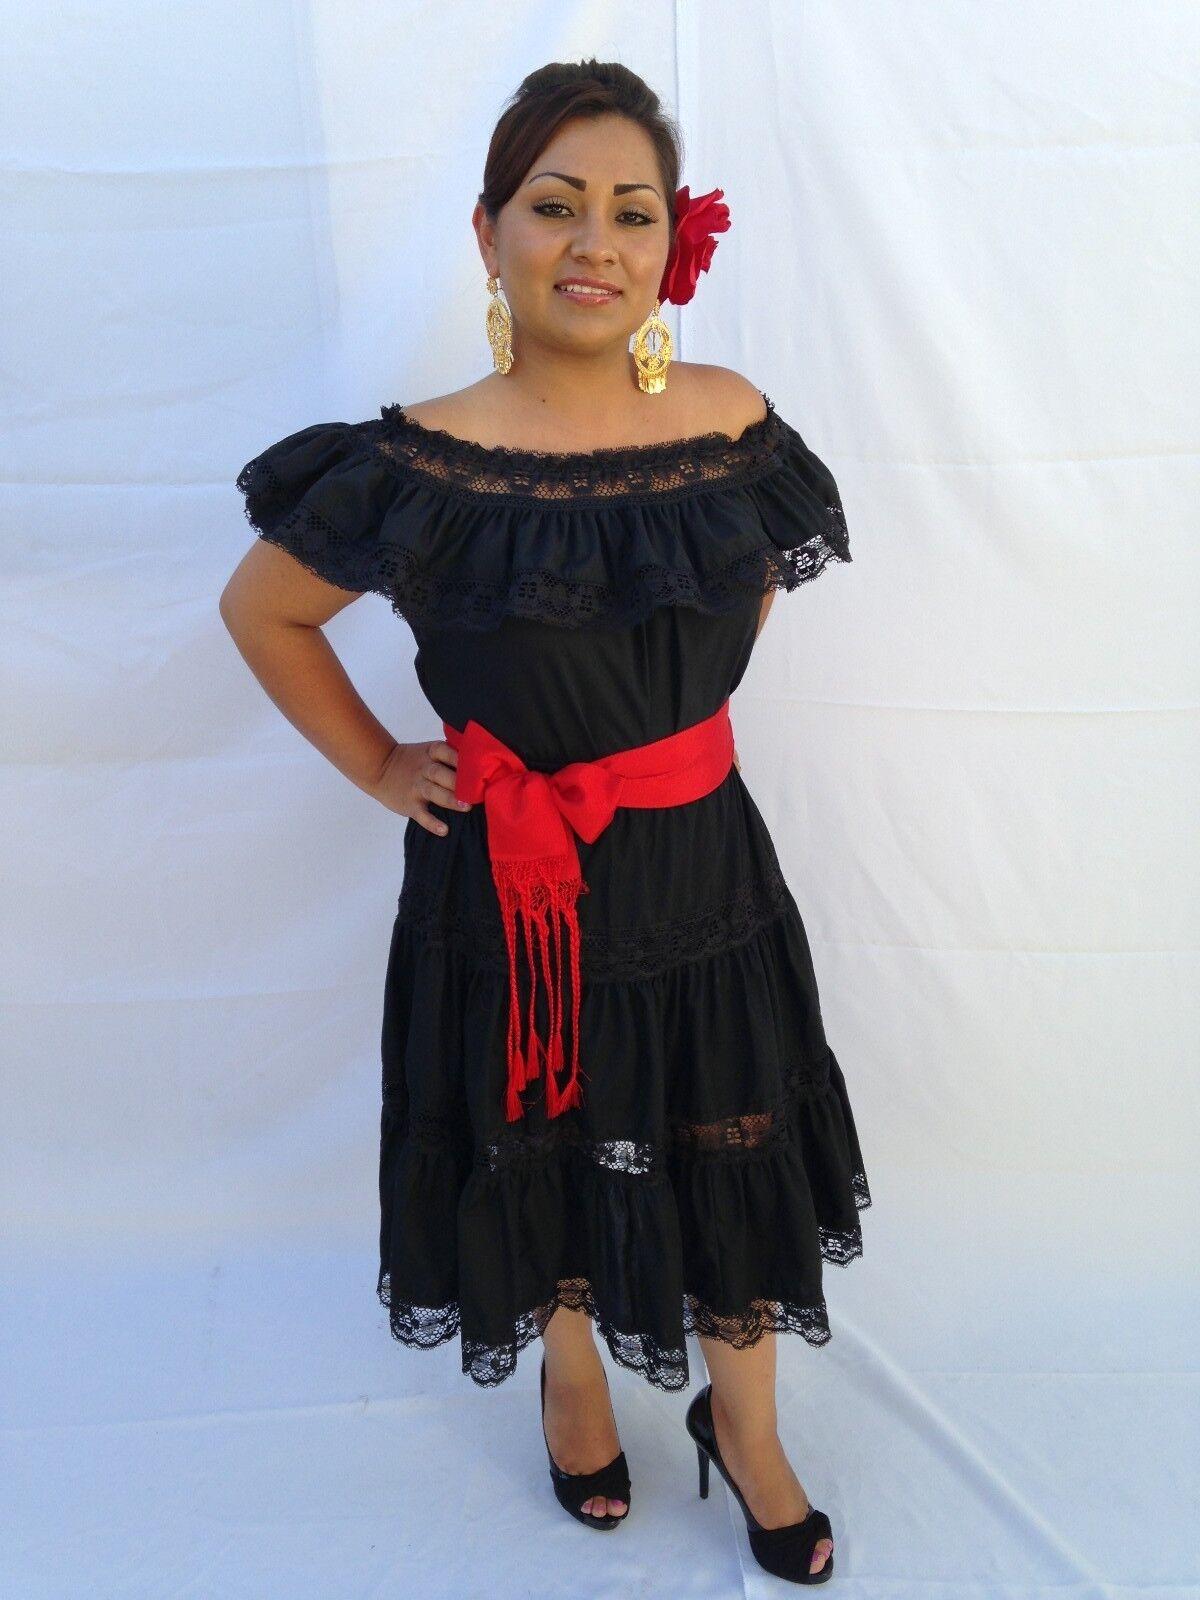 MEXICAN DRESS FIESTA, 5 DE MAYO OFF SHOULDER W RUFFLE 2 PIECE w  MEDIUM rot SASH